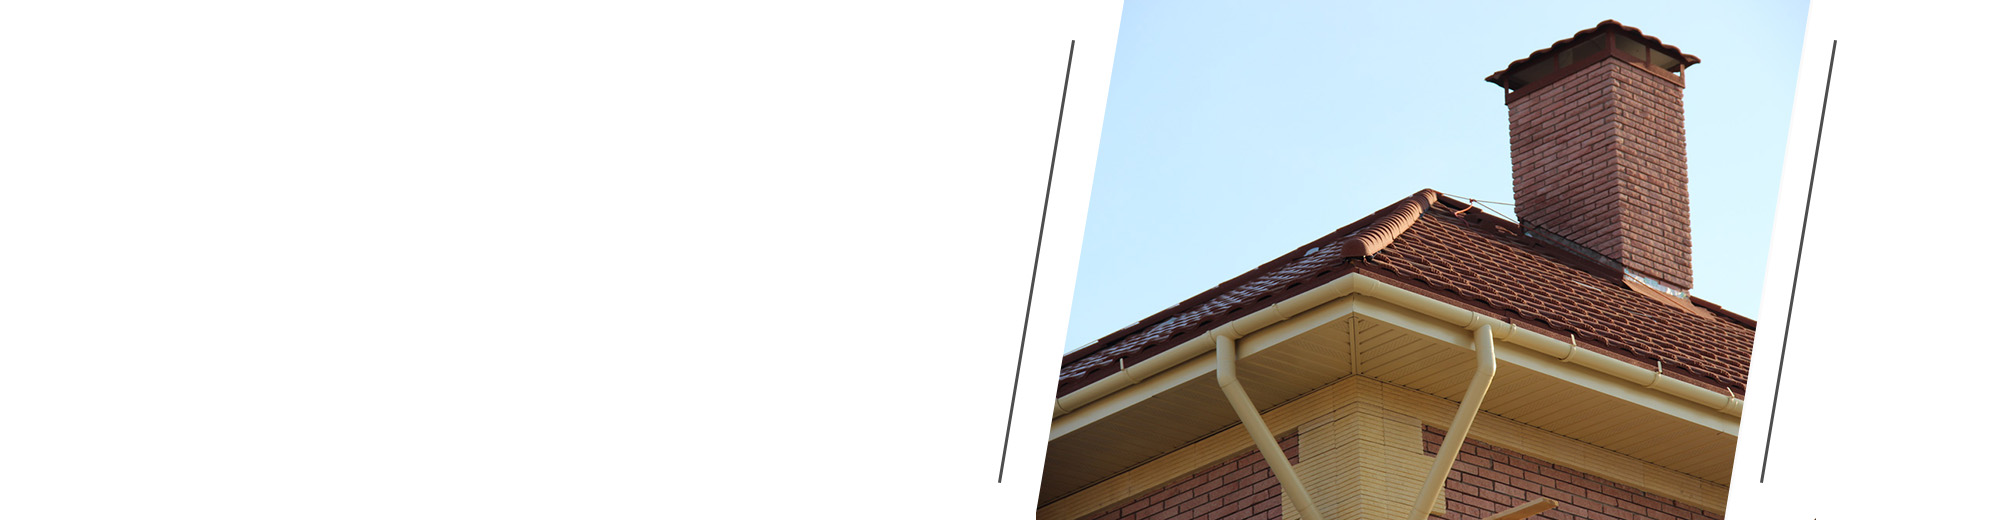 background-img-banner-1